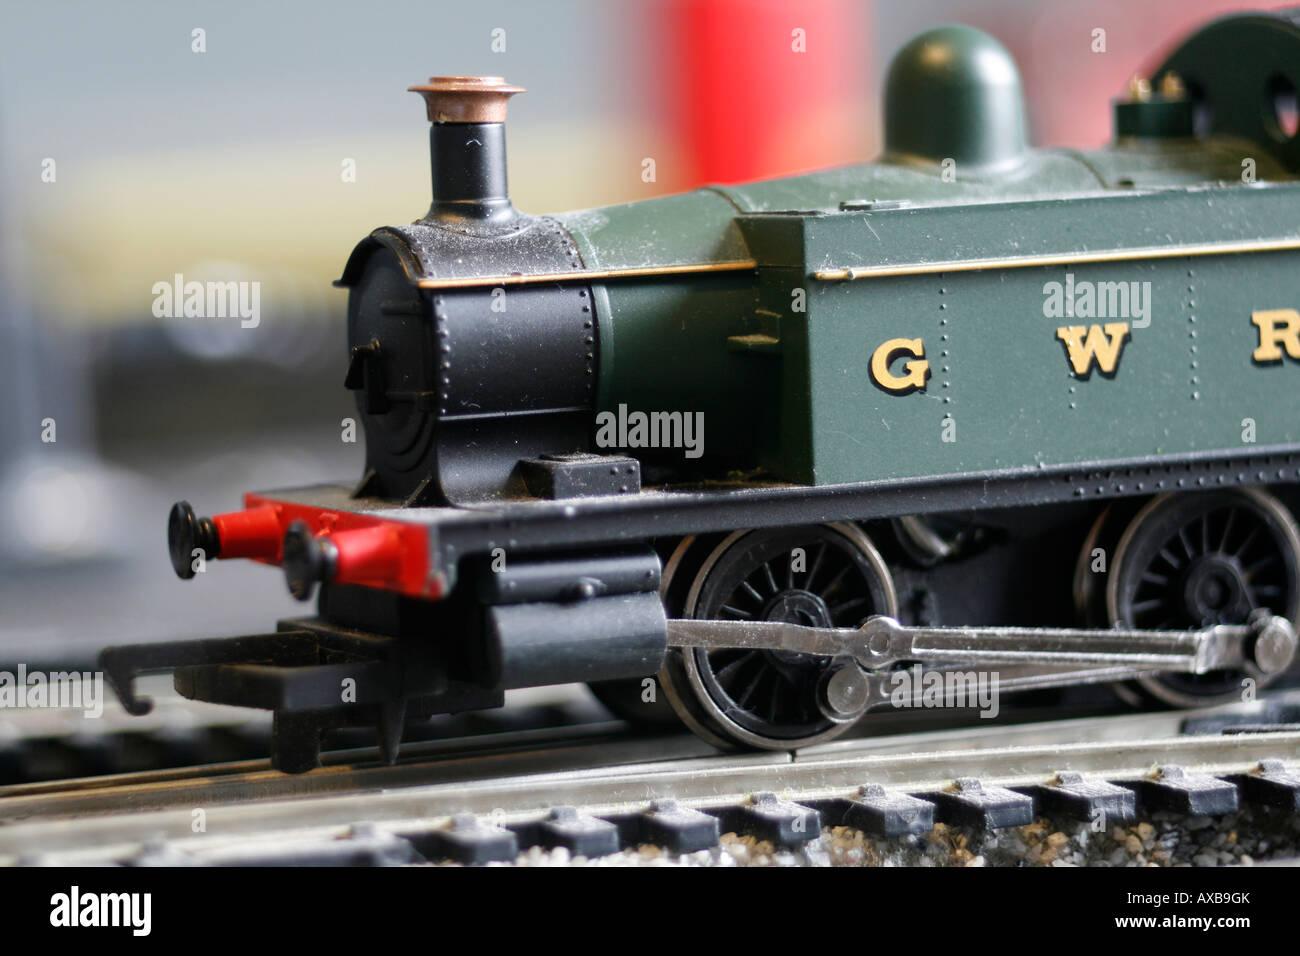 Swindon Built Stock Photos & Swindon Built Stock Images - Alamy